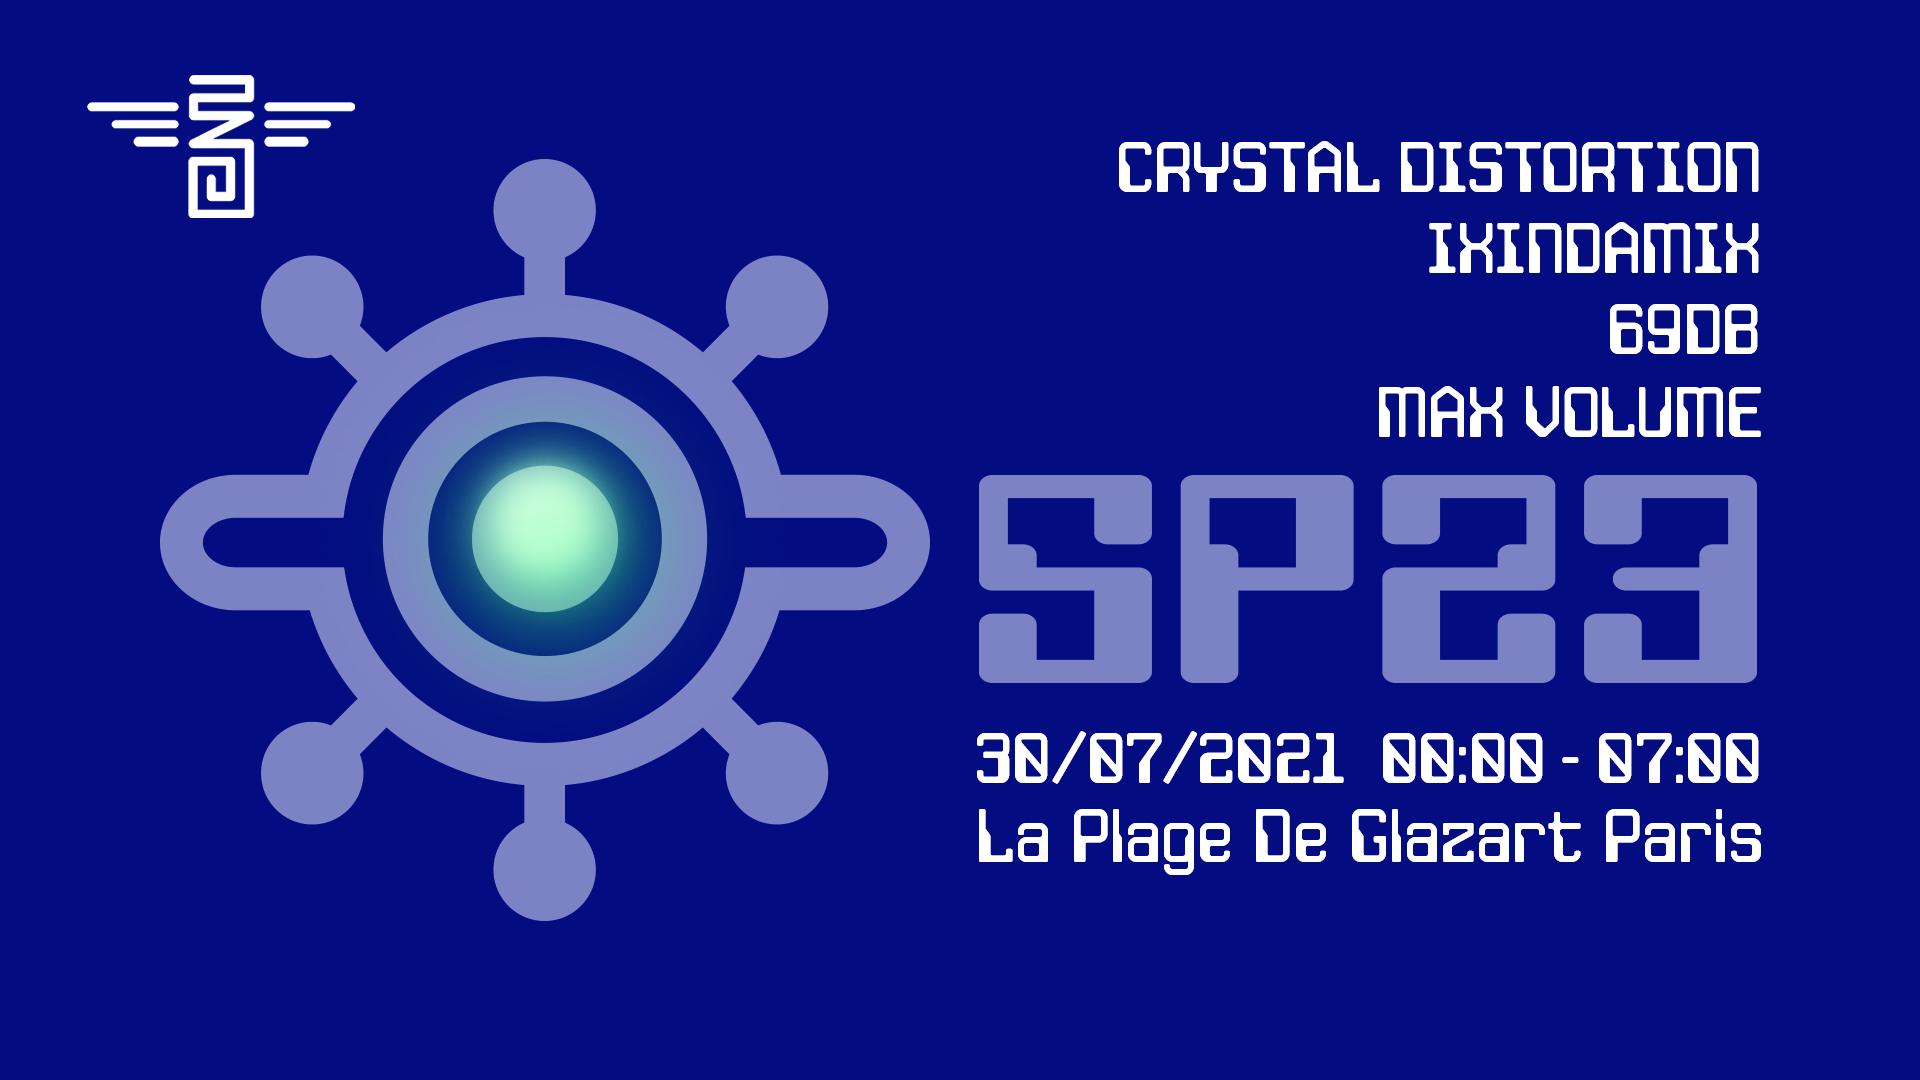 SP23 : CRYSTAL DISTORTION • IXINDAMIX • 69DB • MAX VOLUME